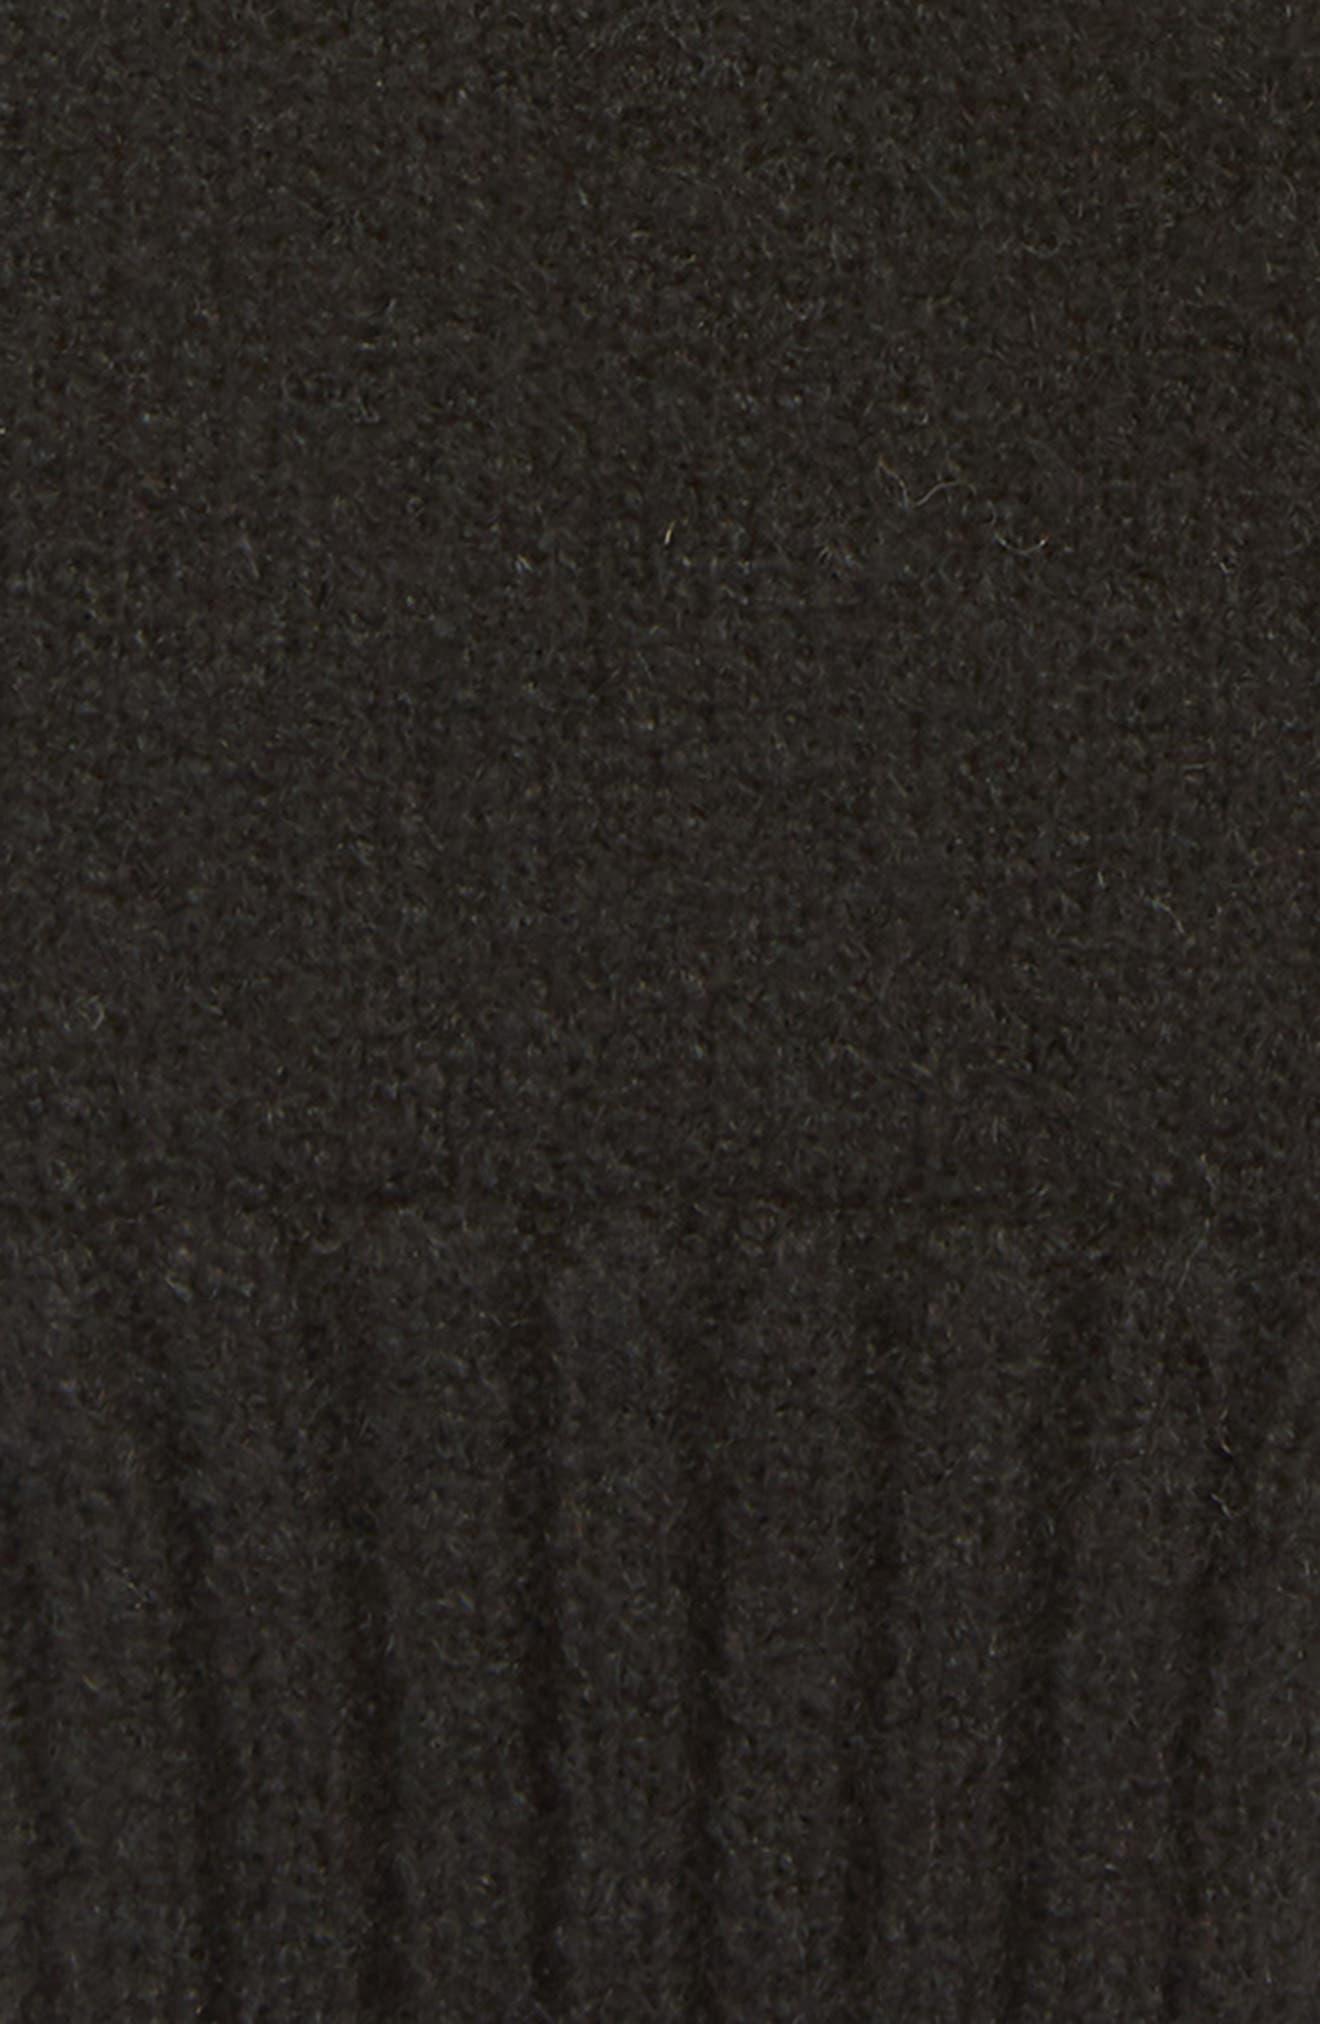 Knit Tech Gloves,                             Alternate thumbnail 3, color,                             BLACK